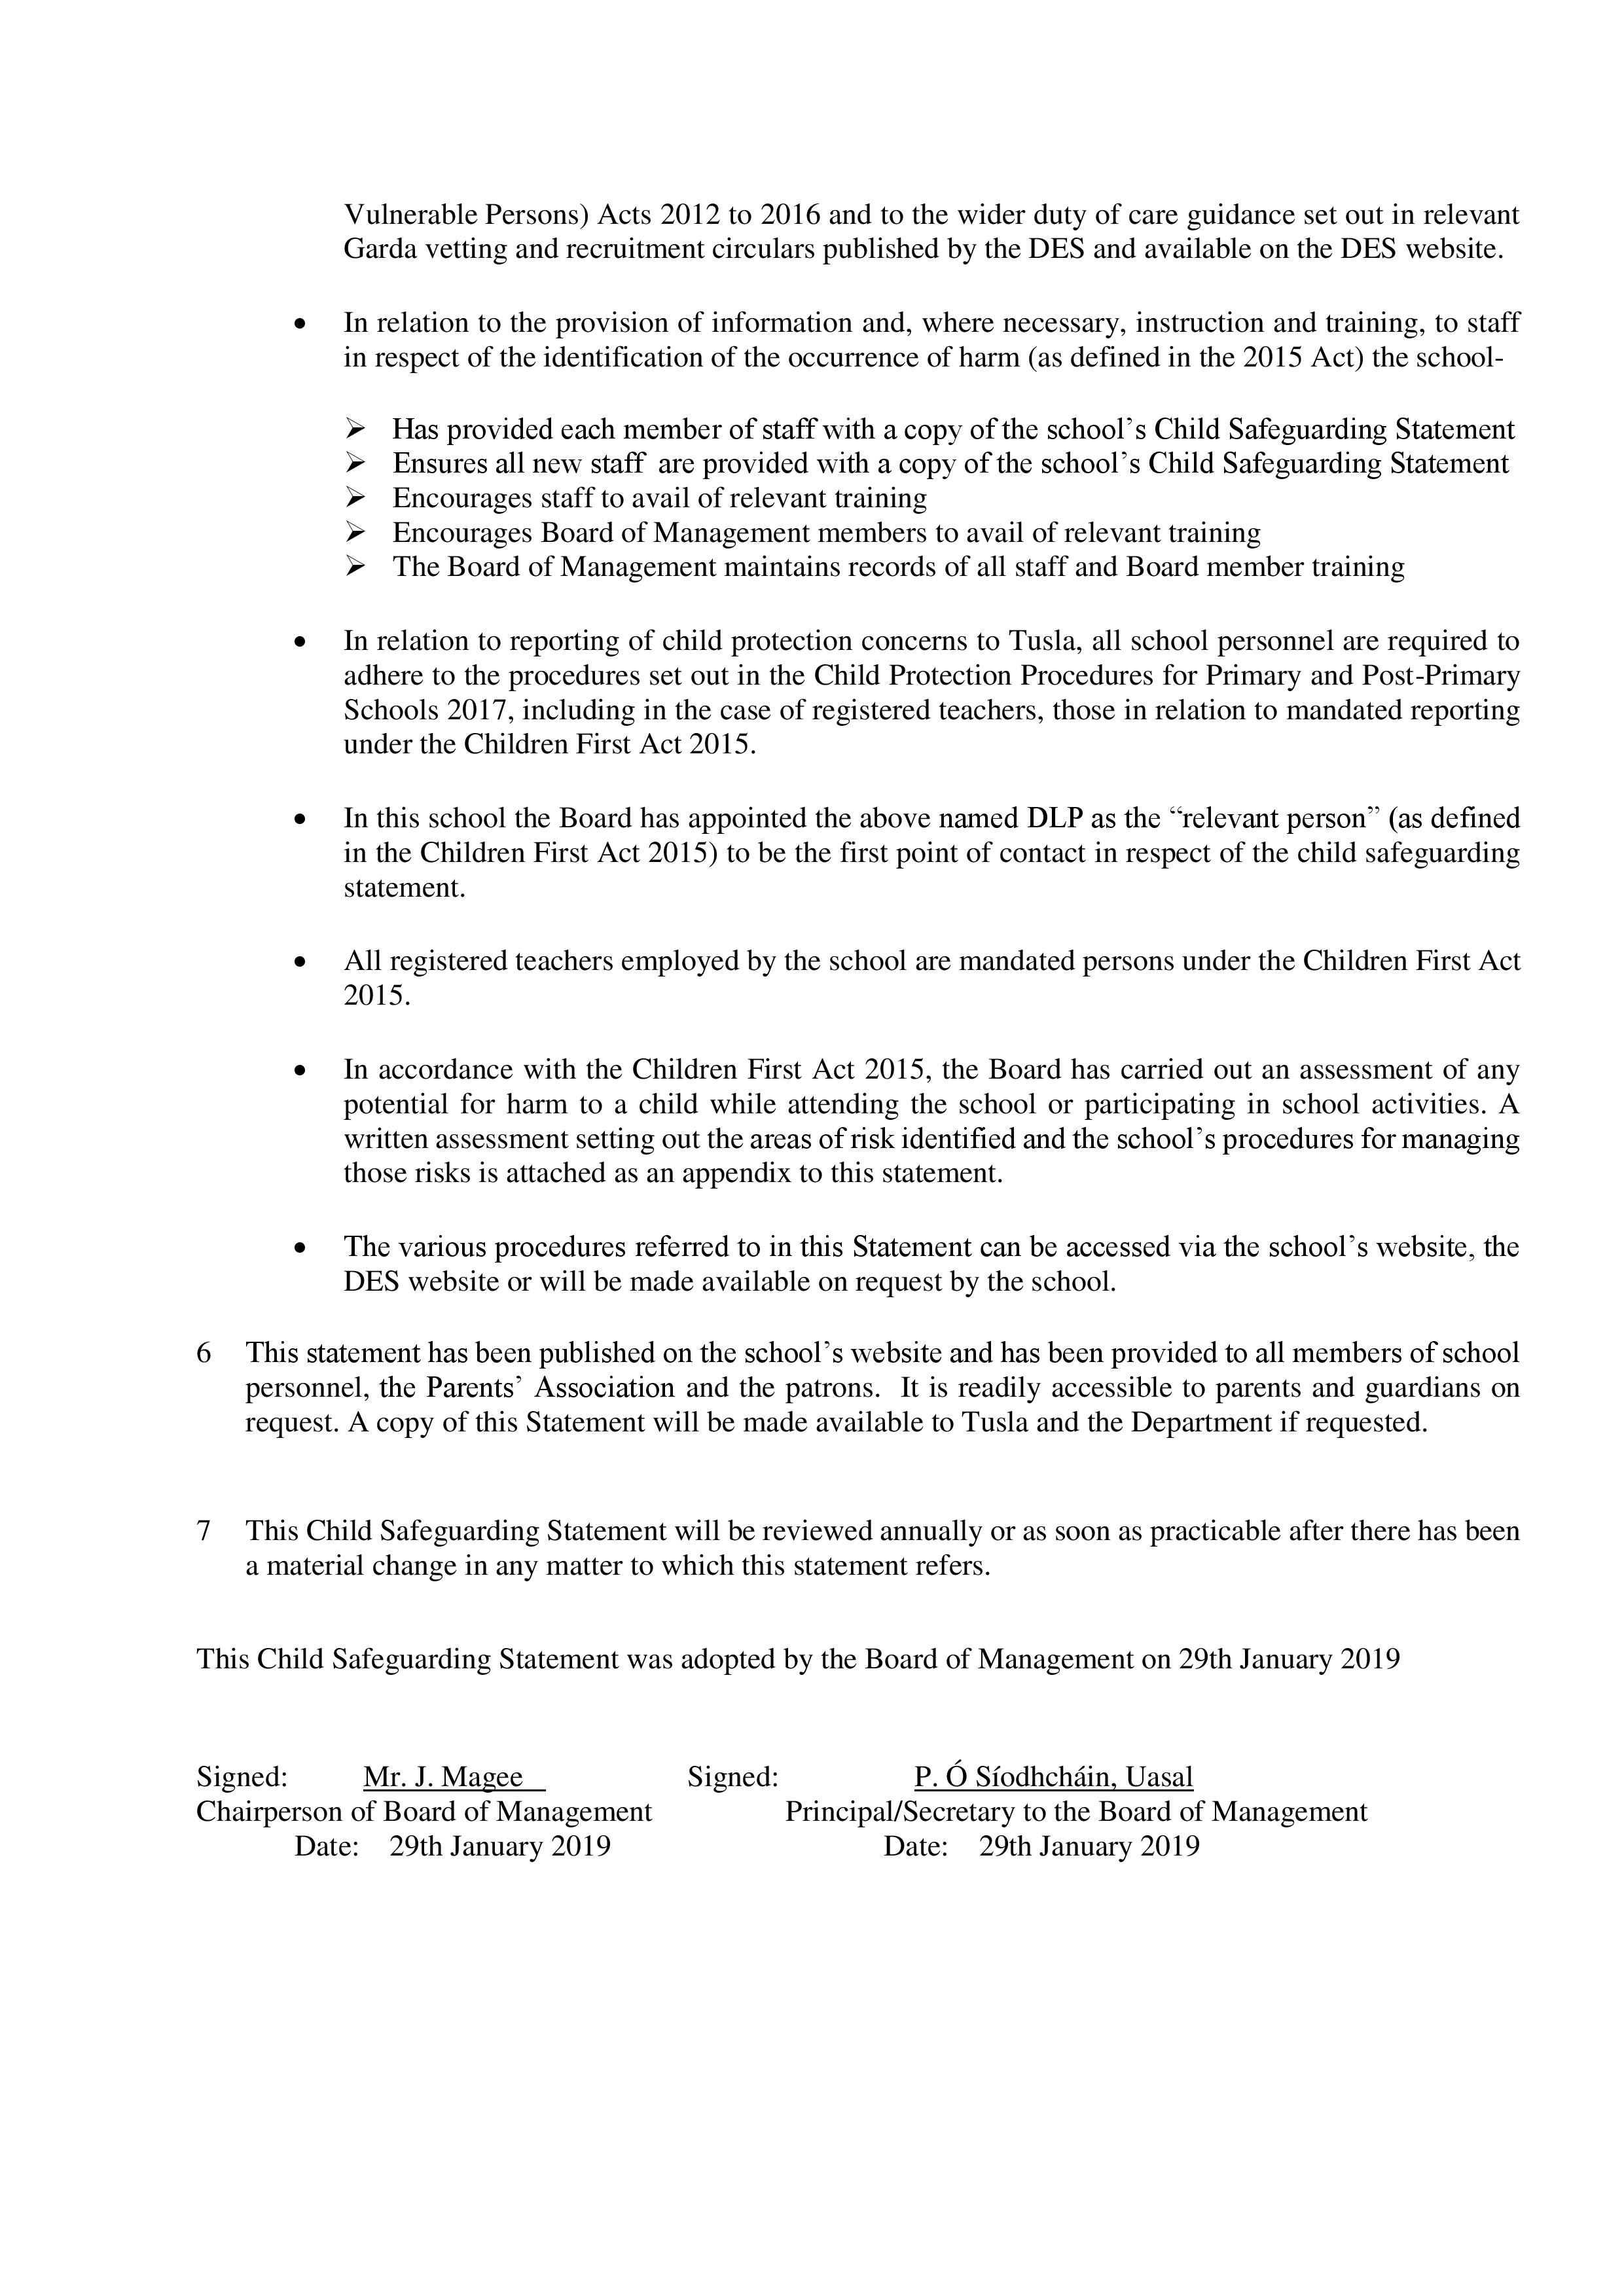 Child Safeguarding Statement-page-002.jpg